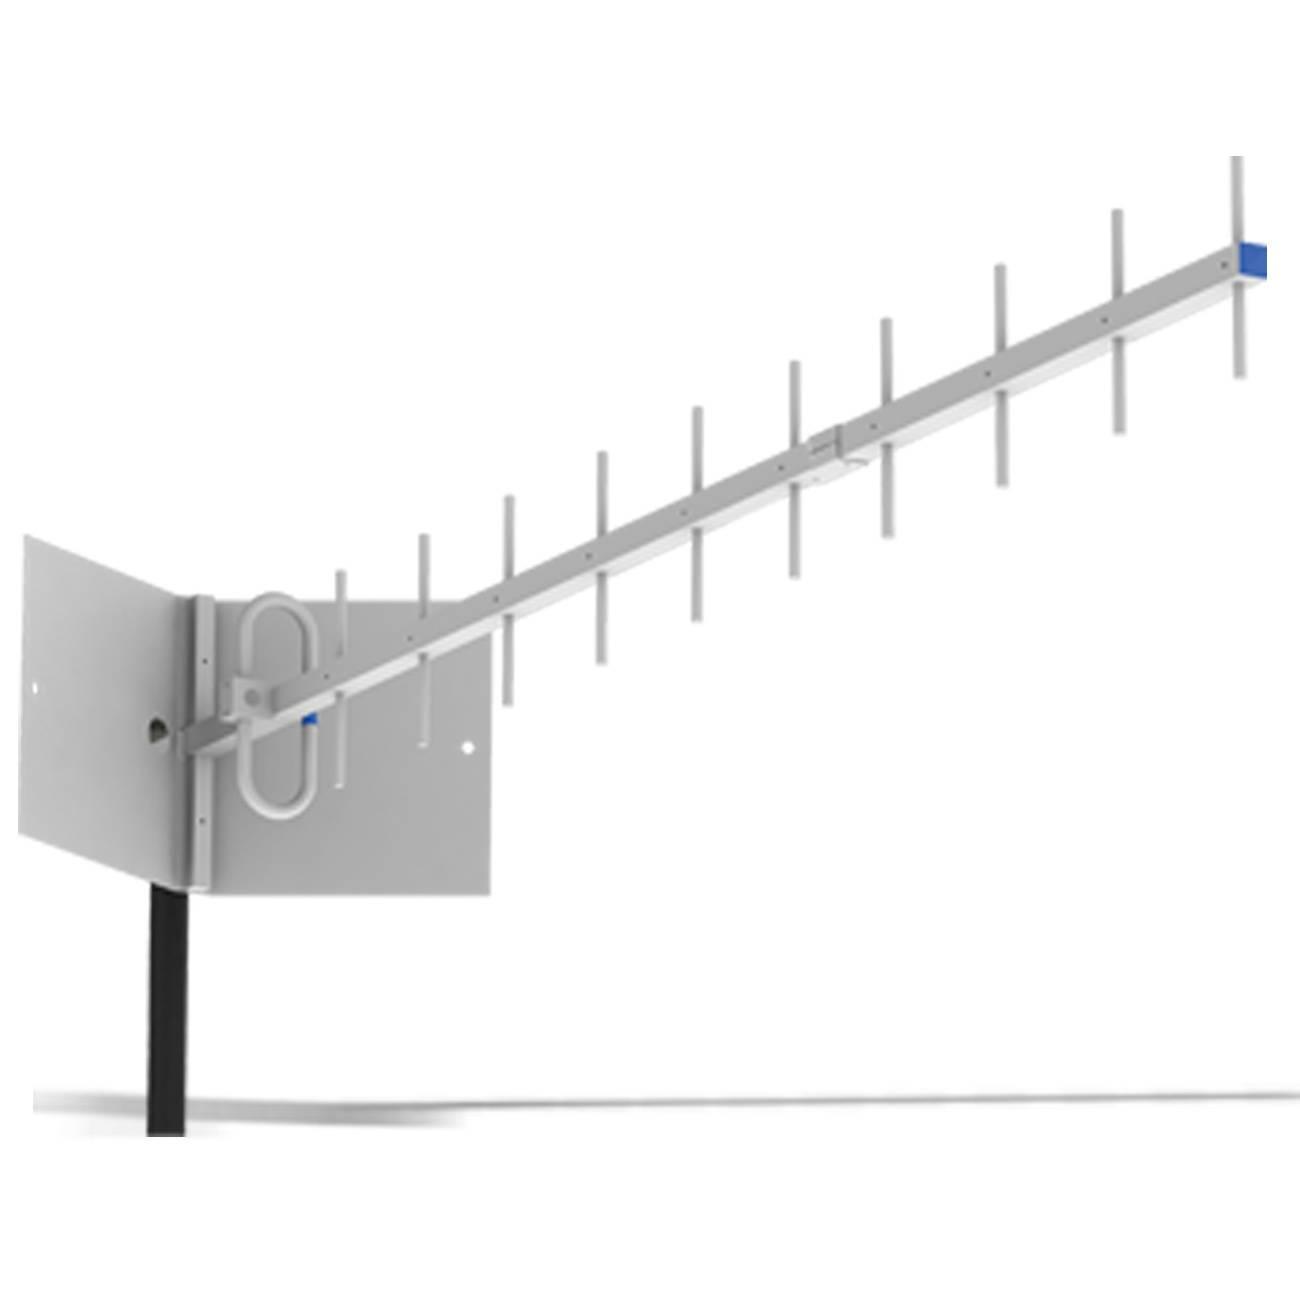 Antena Captar Sinal Operadora De Celular Anatel JFA 900MHZ 17DBI Compacta